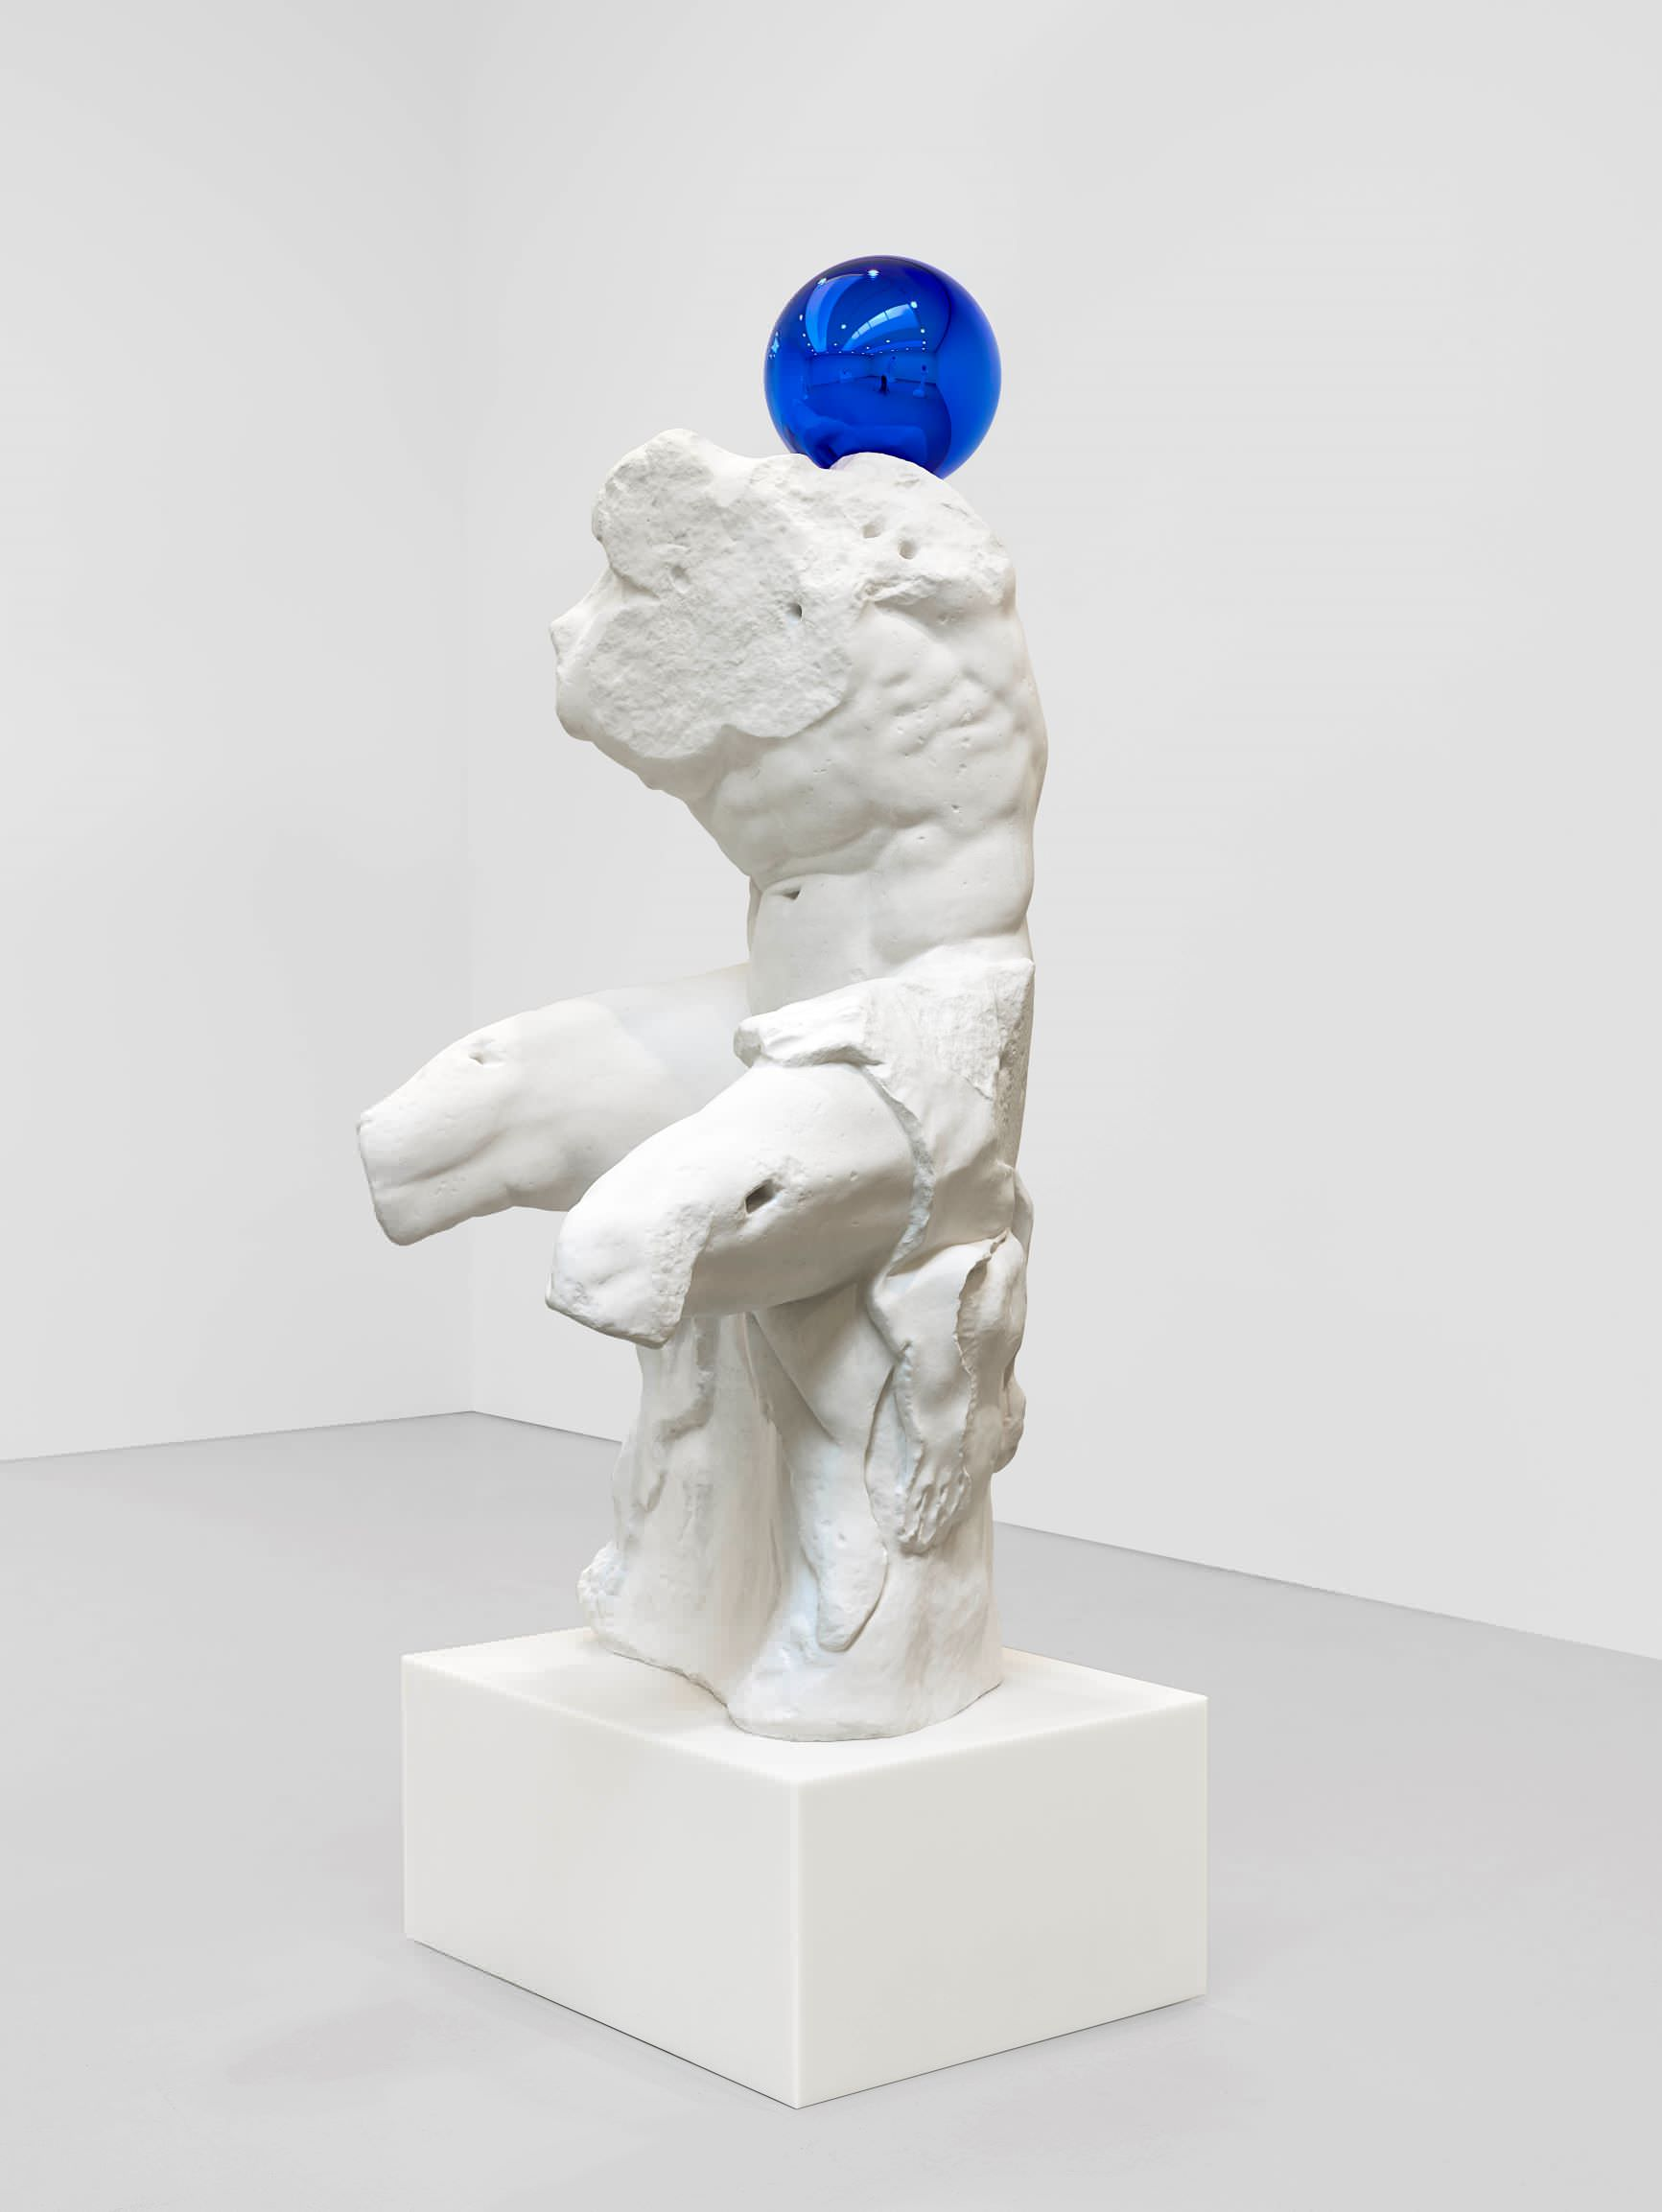 Jeff Koons (b. 1955); Gazing Ball (Belvedere Torso); 2013; Plaster and glass; 181.6 x 75.9 x 89.2 cm; Artist's proof of an edition of 3 plus AP; Collection of the artist © Jeff Koons. Photo: Tom Powel Imaging. Courtesy Gagosian